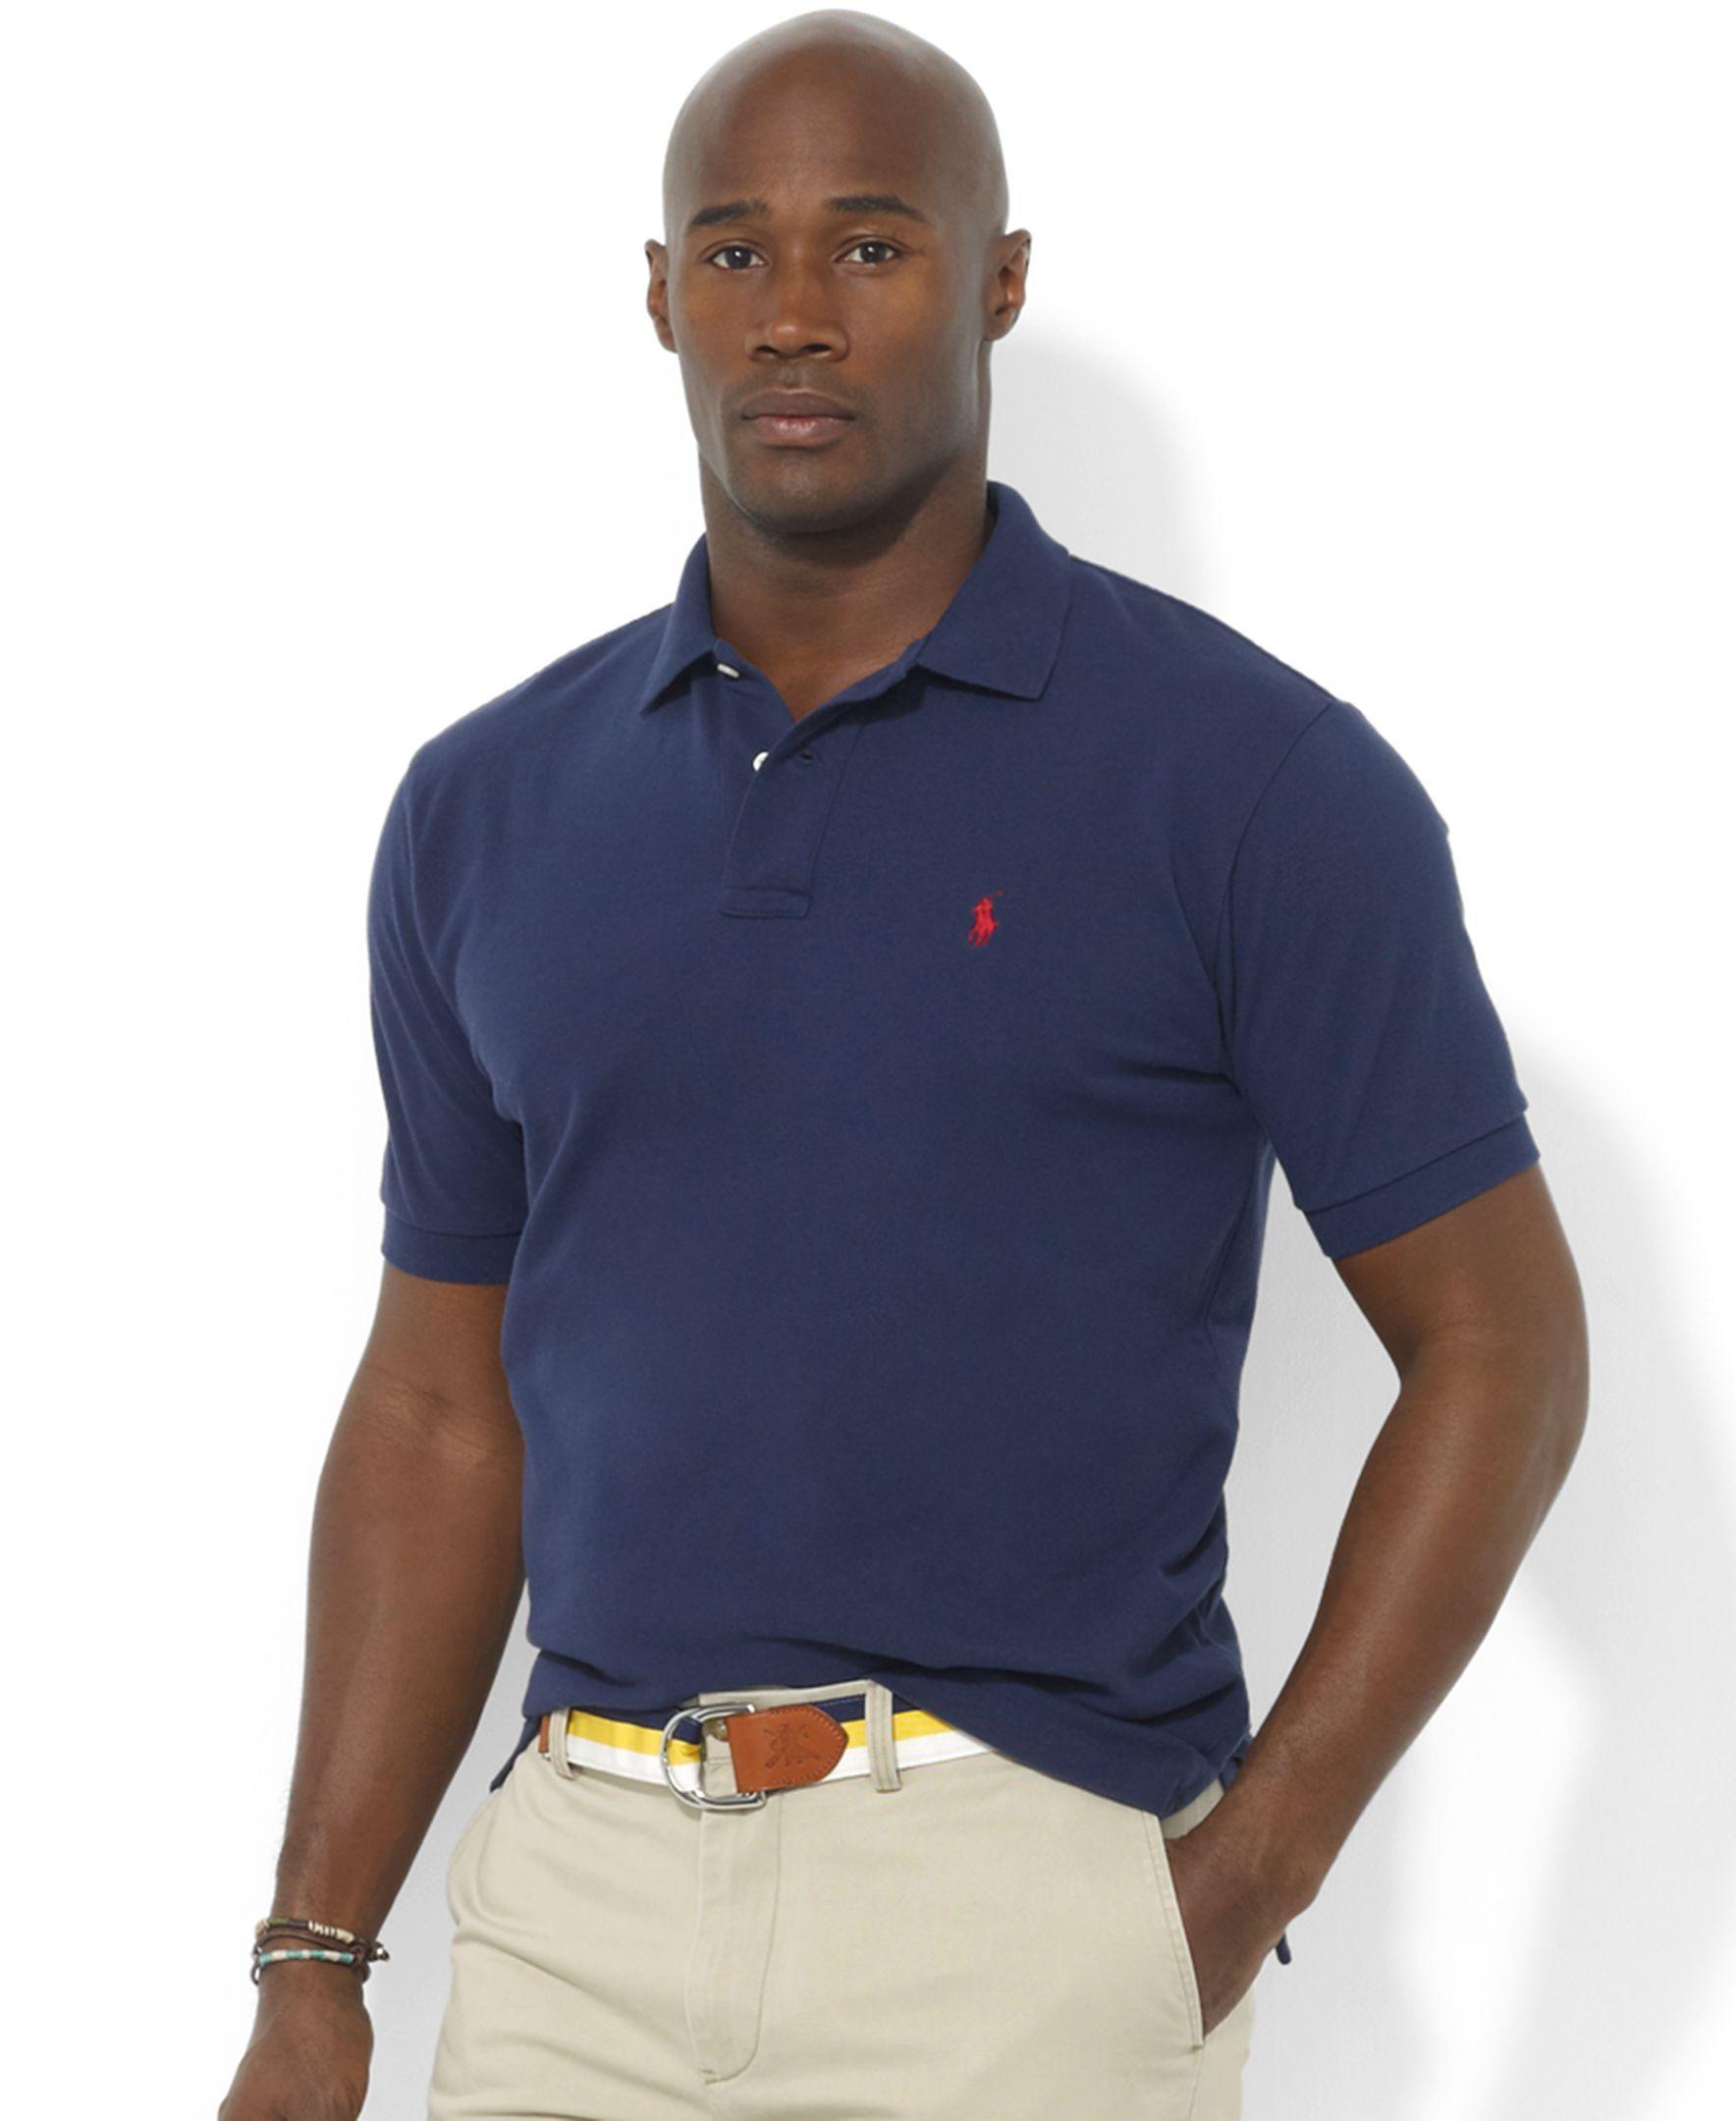 7b4402fe Polo Ralph Lauren Big and Tall Shirt, Classic-Fit Short-Sleeve Cotton Mesh  Polo